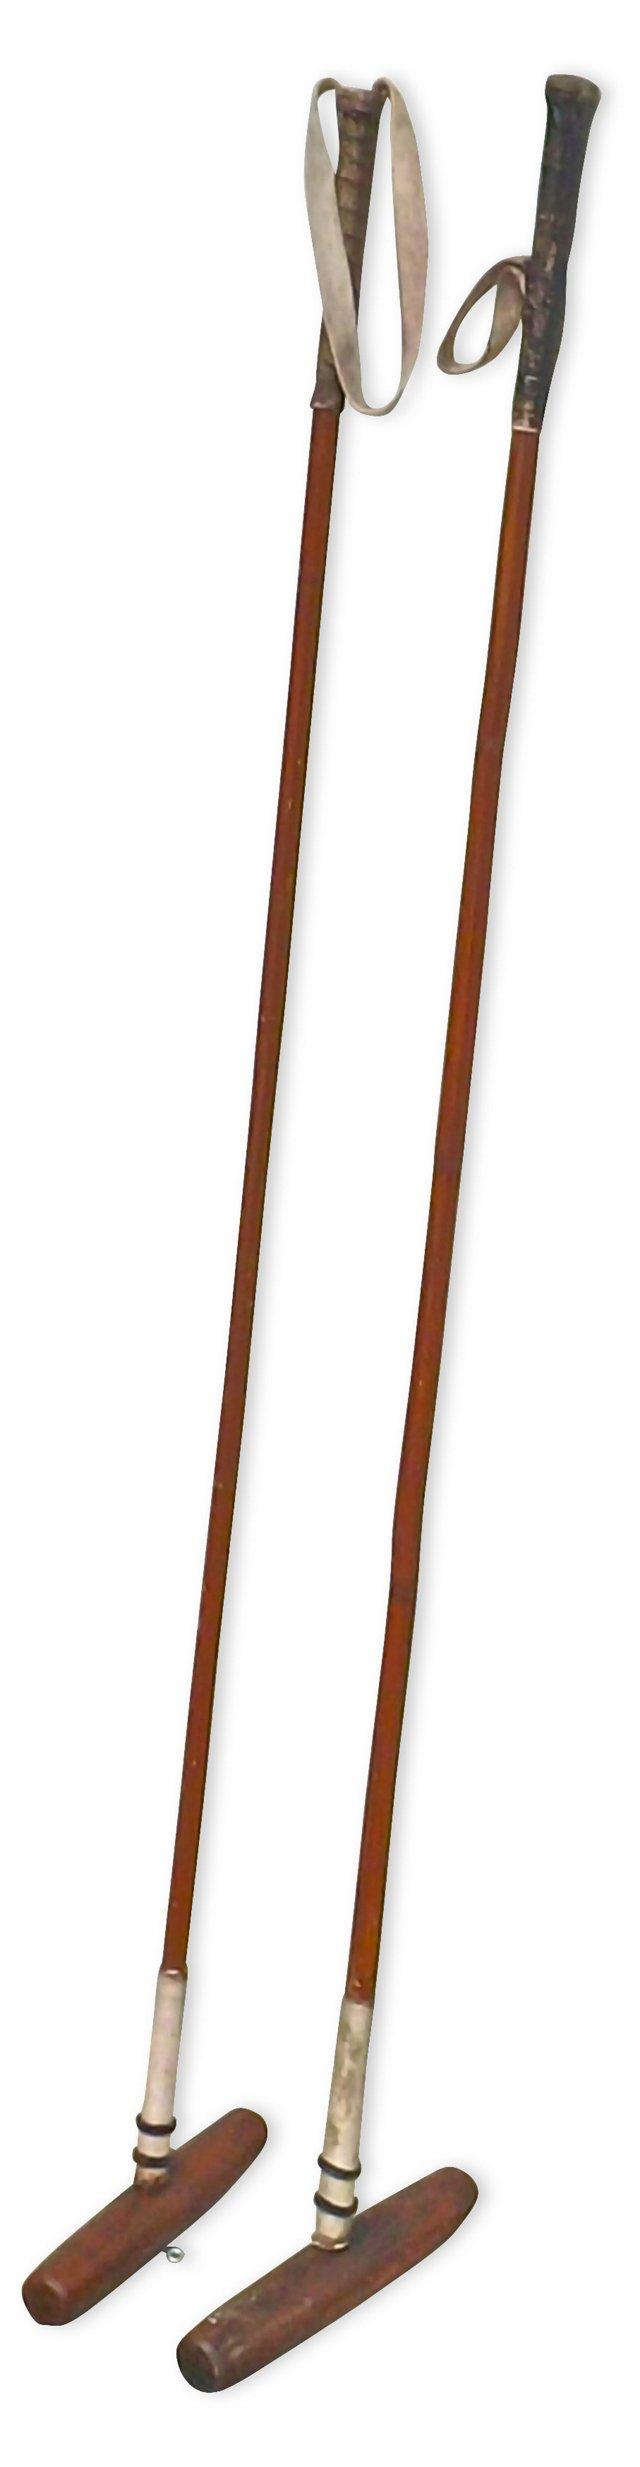 Antique Polo Mallets, Pair